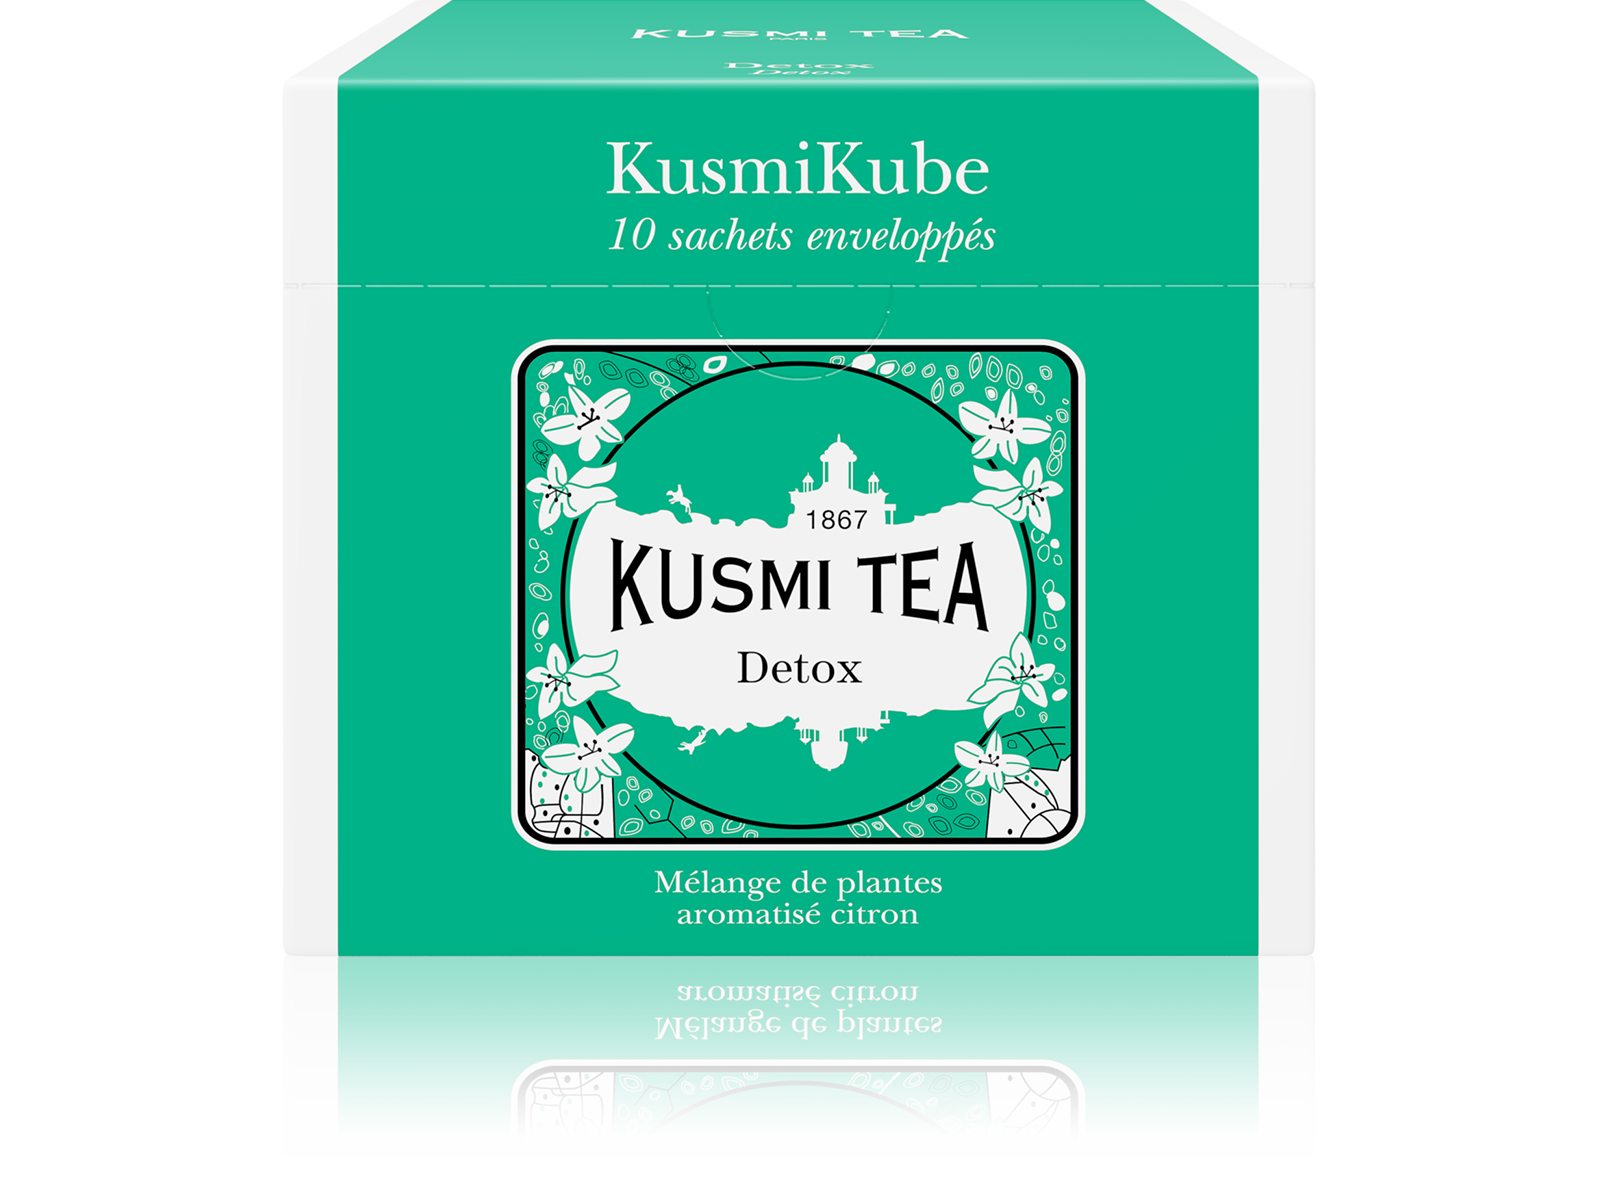 Detox- Thé vert, Maté, Citron - Kusmi Tea